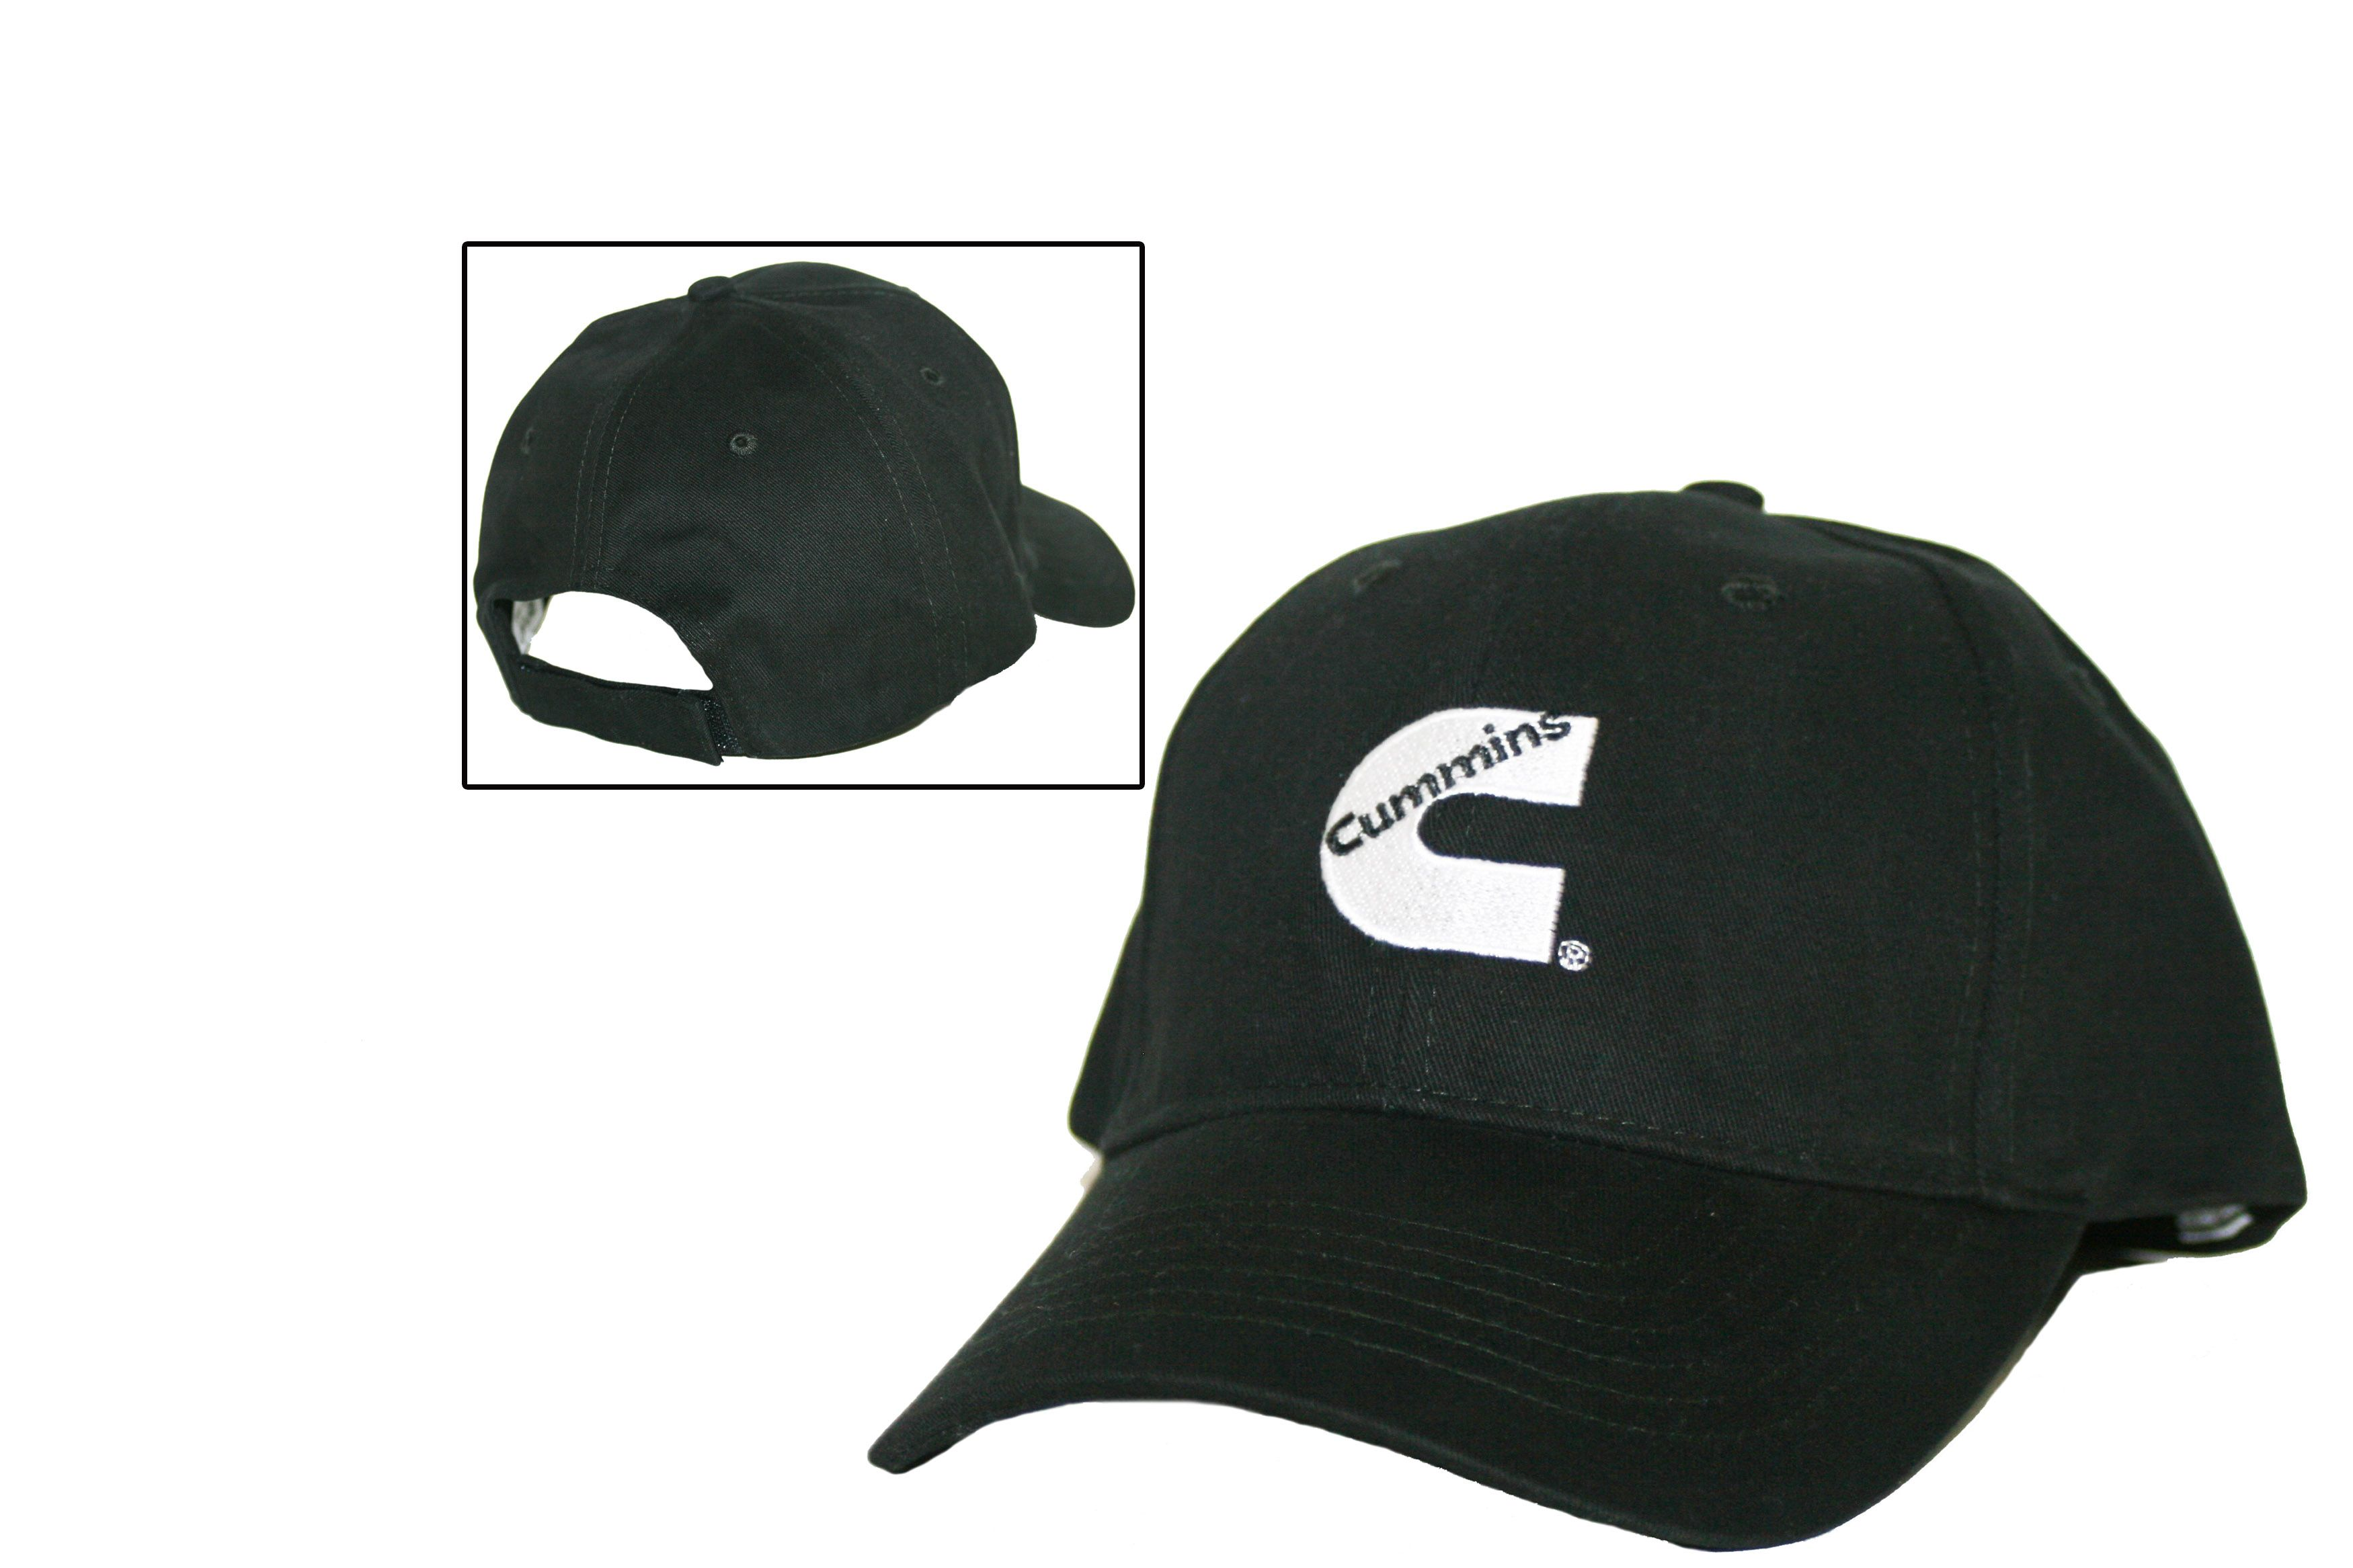 d47b35fabcb57 Cummins Diesel Basic Black Cap - Cummins Merchandise - Cummins Diesel  Merchandise